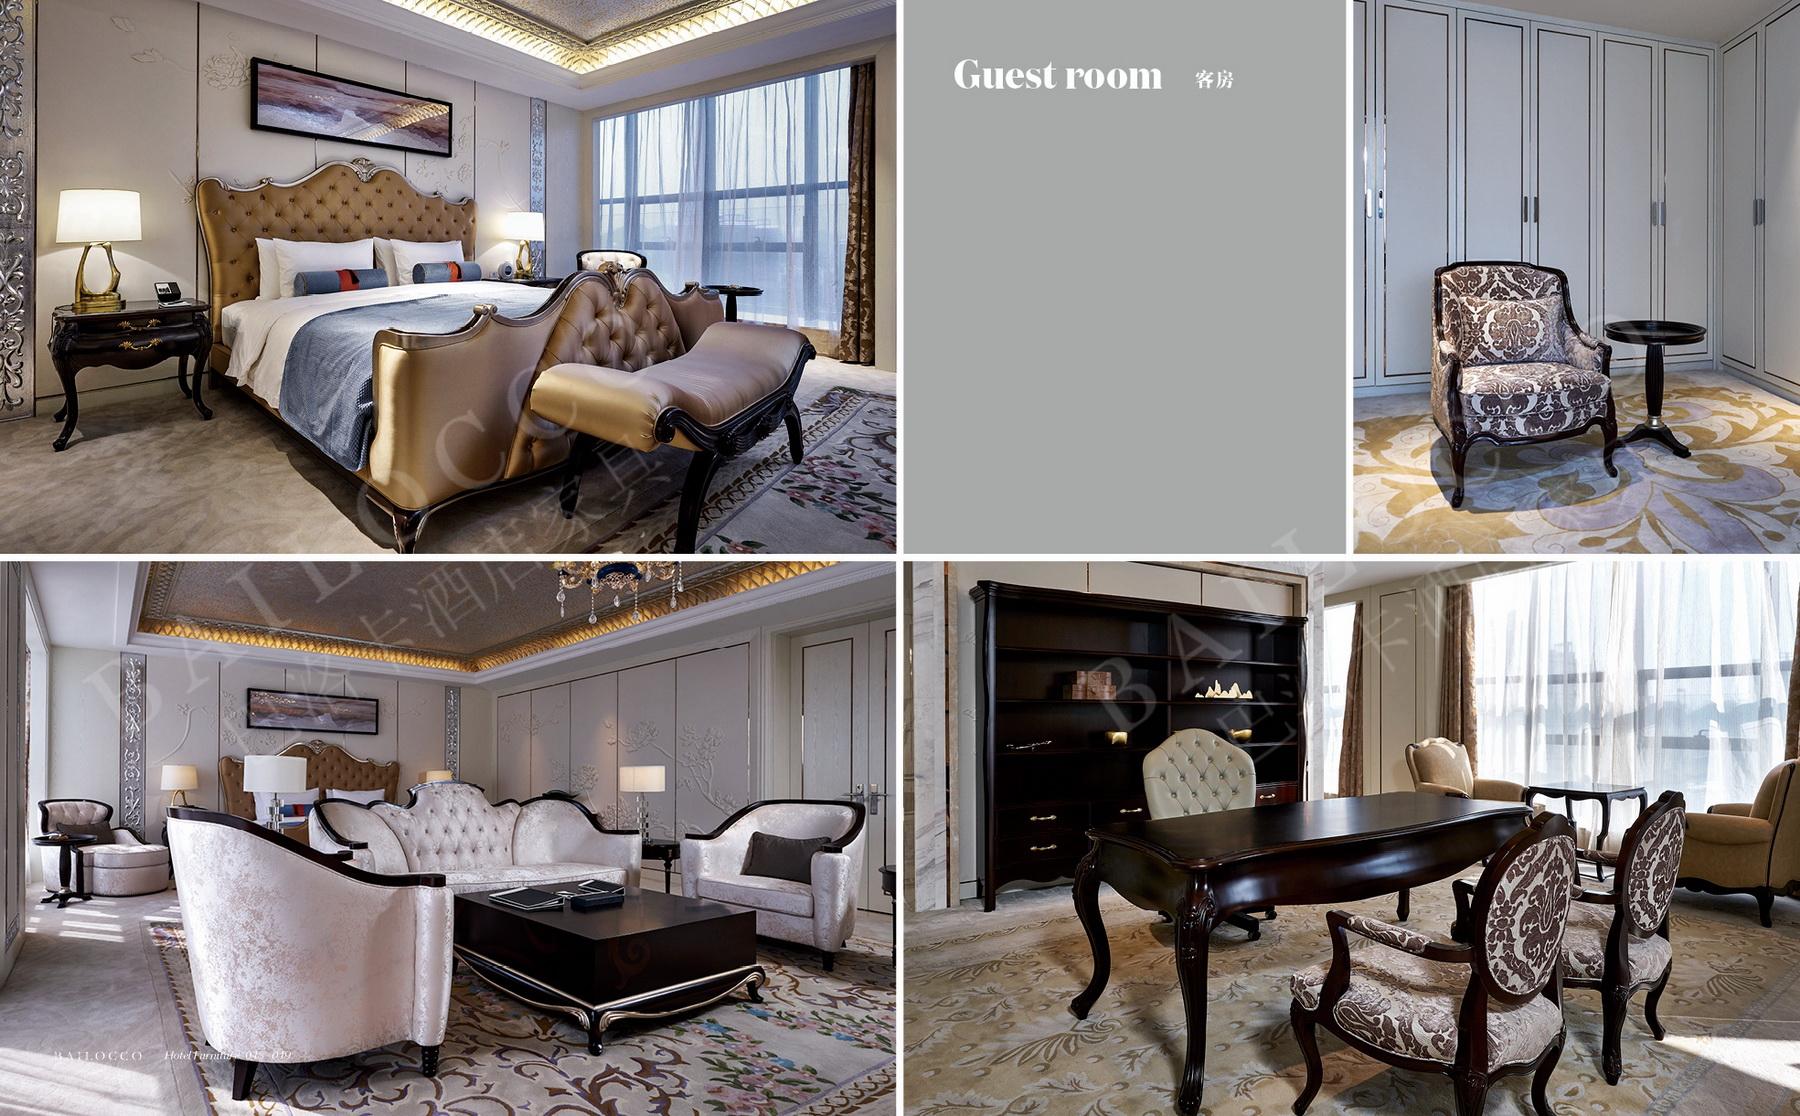 Bailocco hotel room set